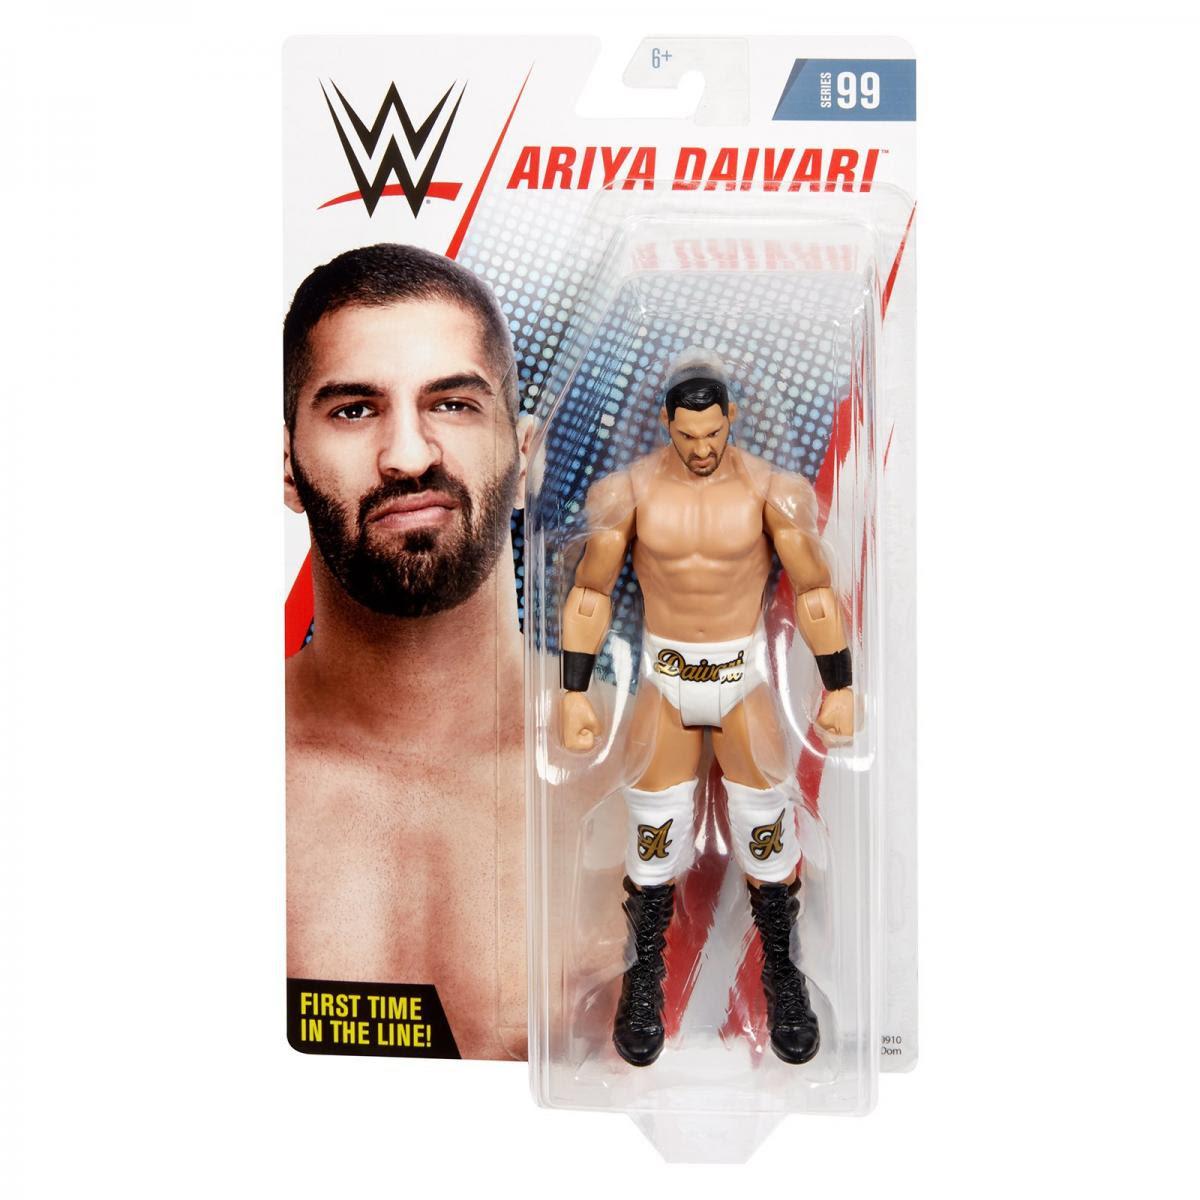 Image of WWE Basic Series 99 - Ariya Daivari - SEPTEMBER 2019